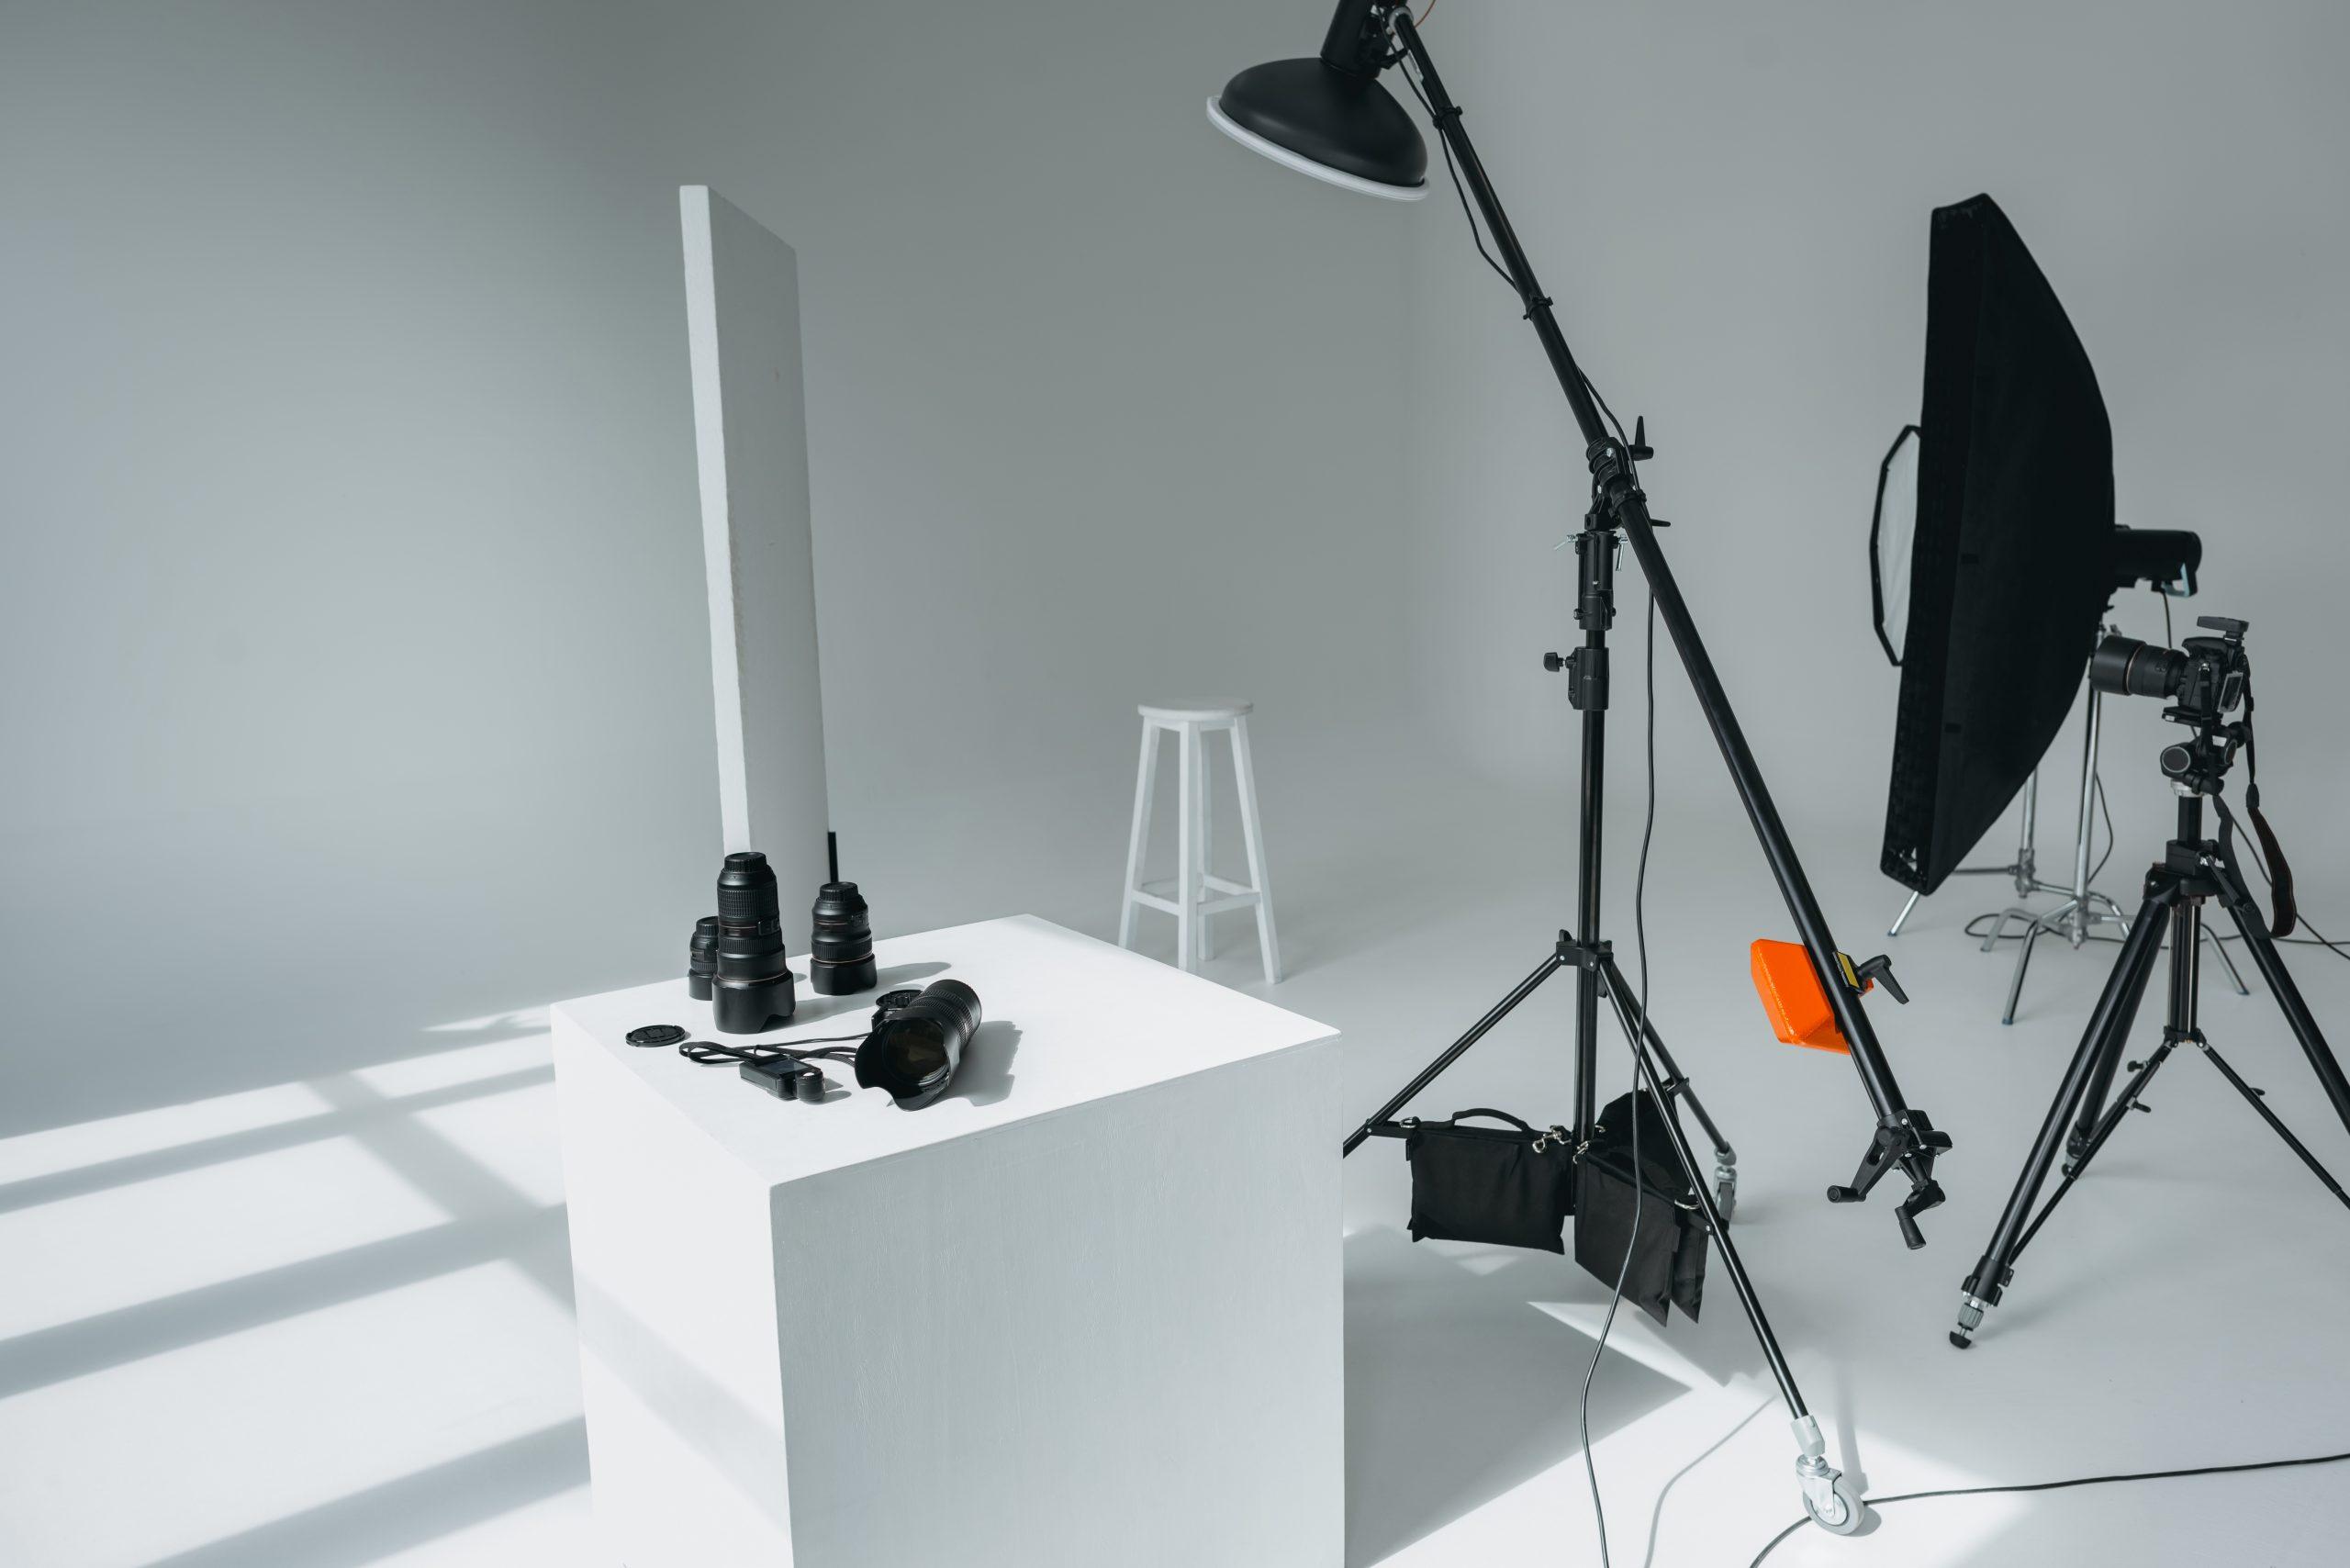 Best portable photography lighting kits